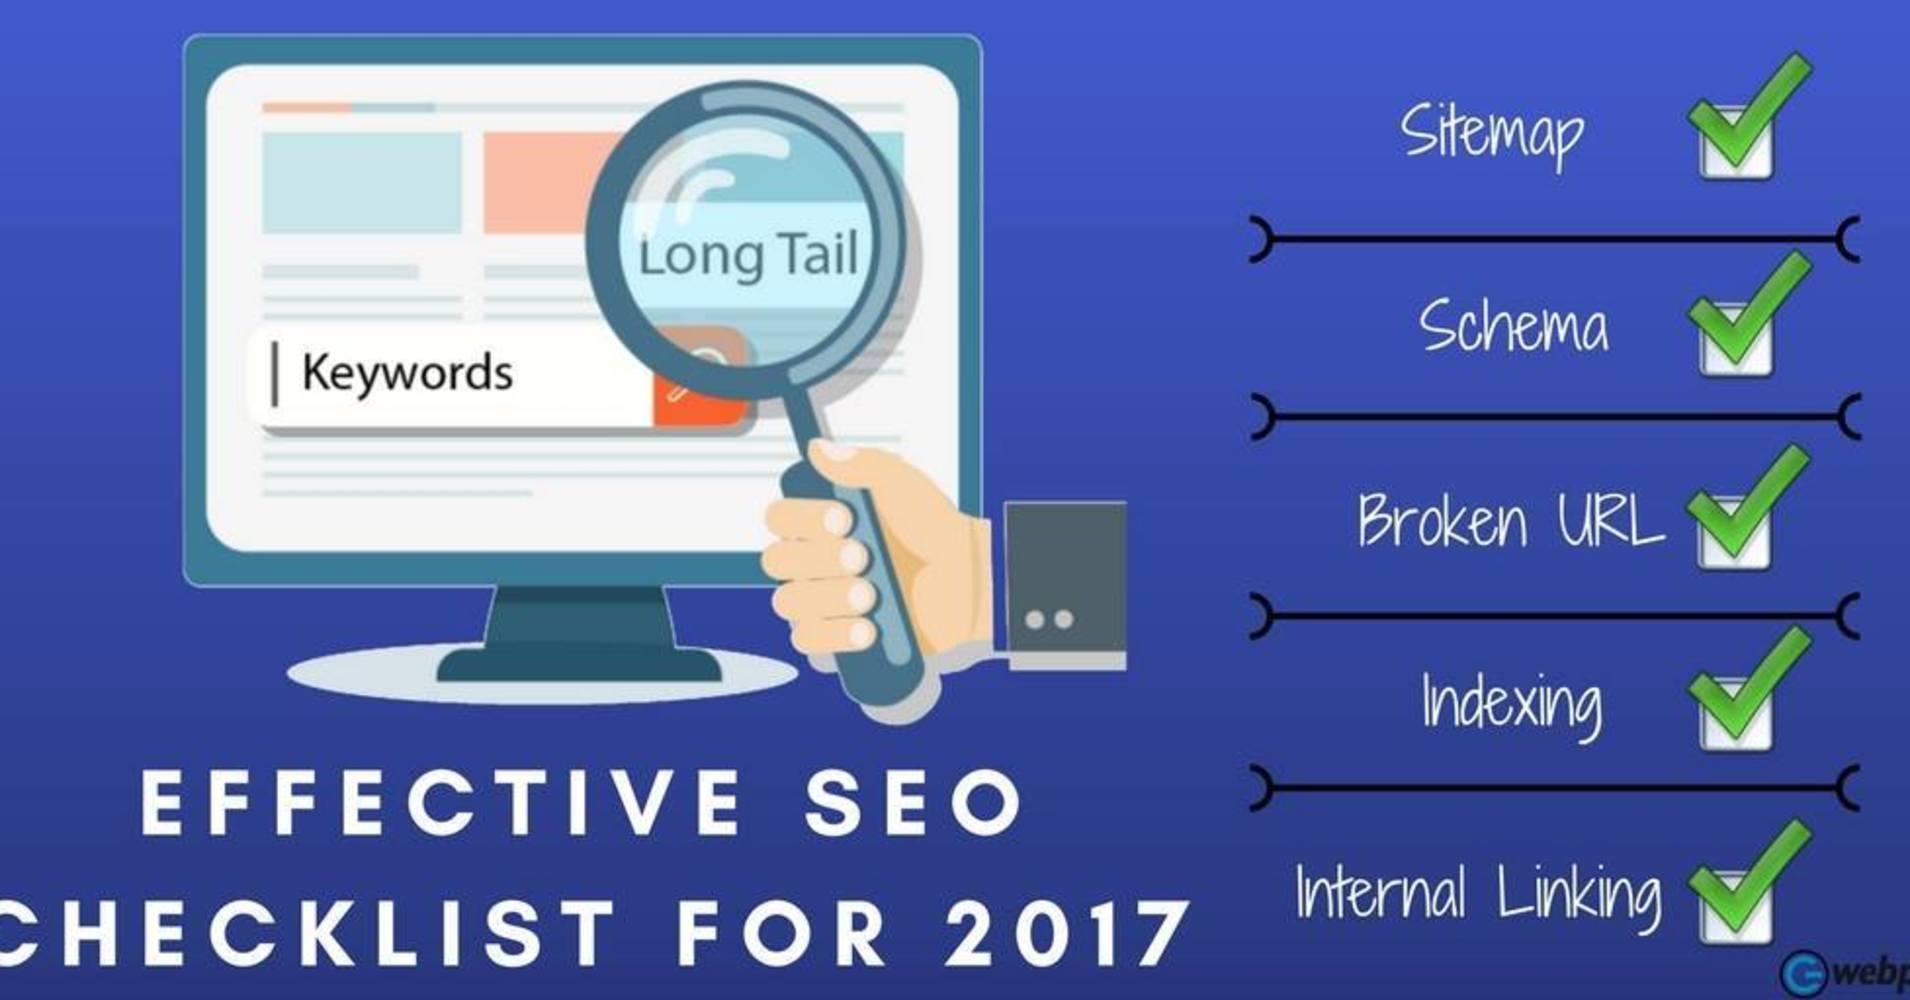 Effective SEO Checklist for 2017